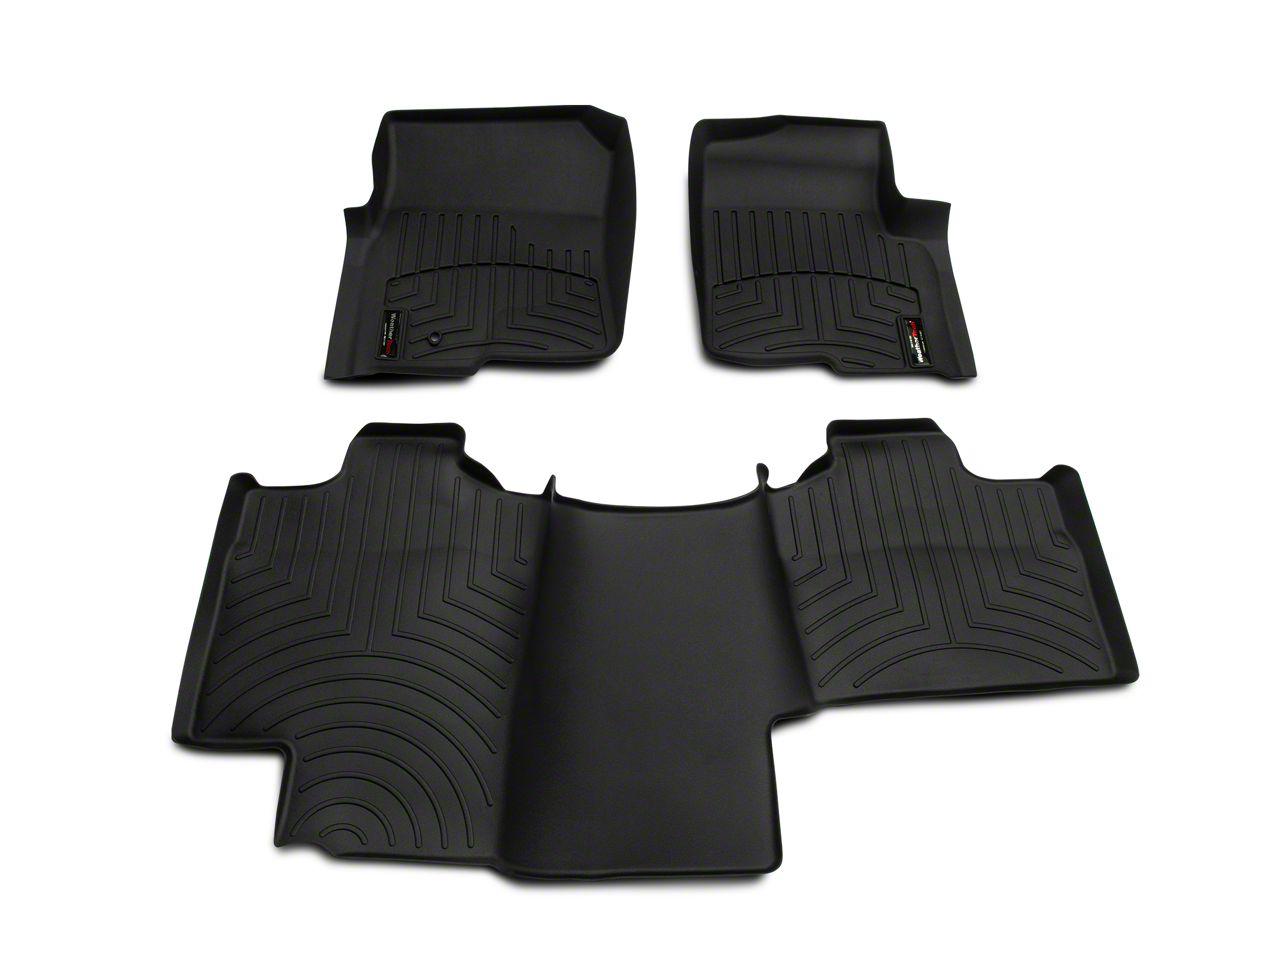 Weathertech DigitalFit Front & Rear Floor Liners - Black (04-08 F-150 SuperCab)